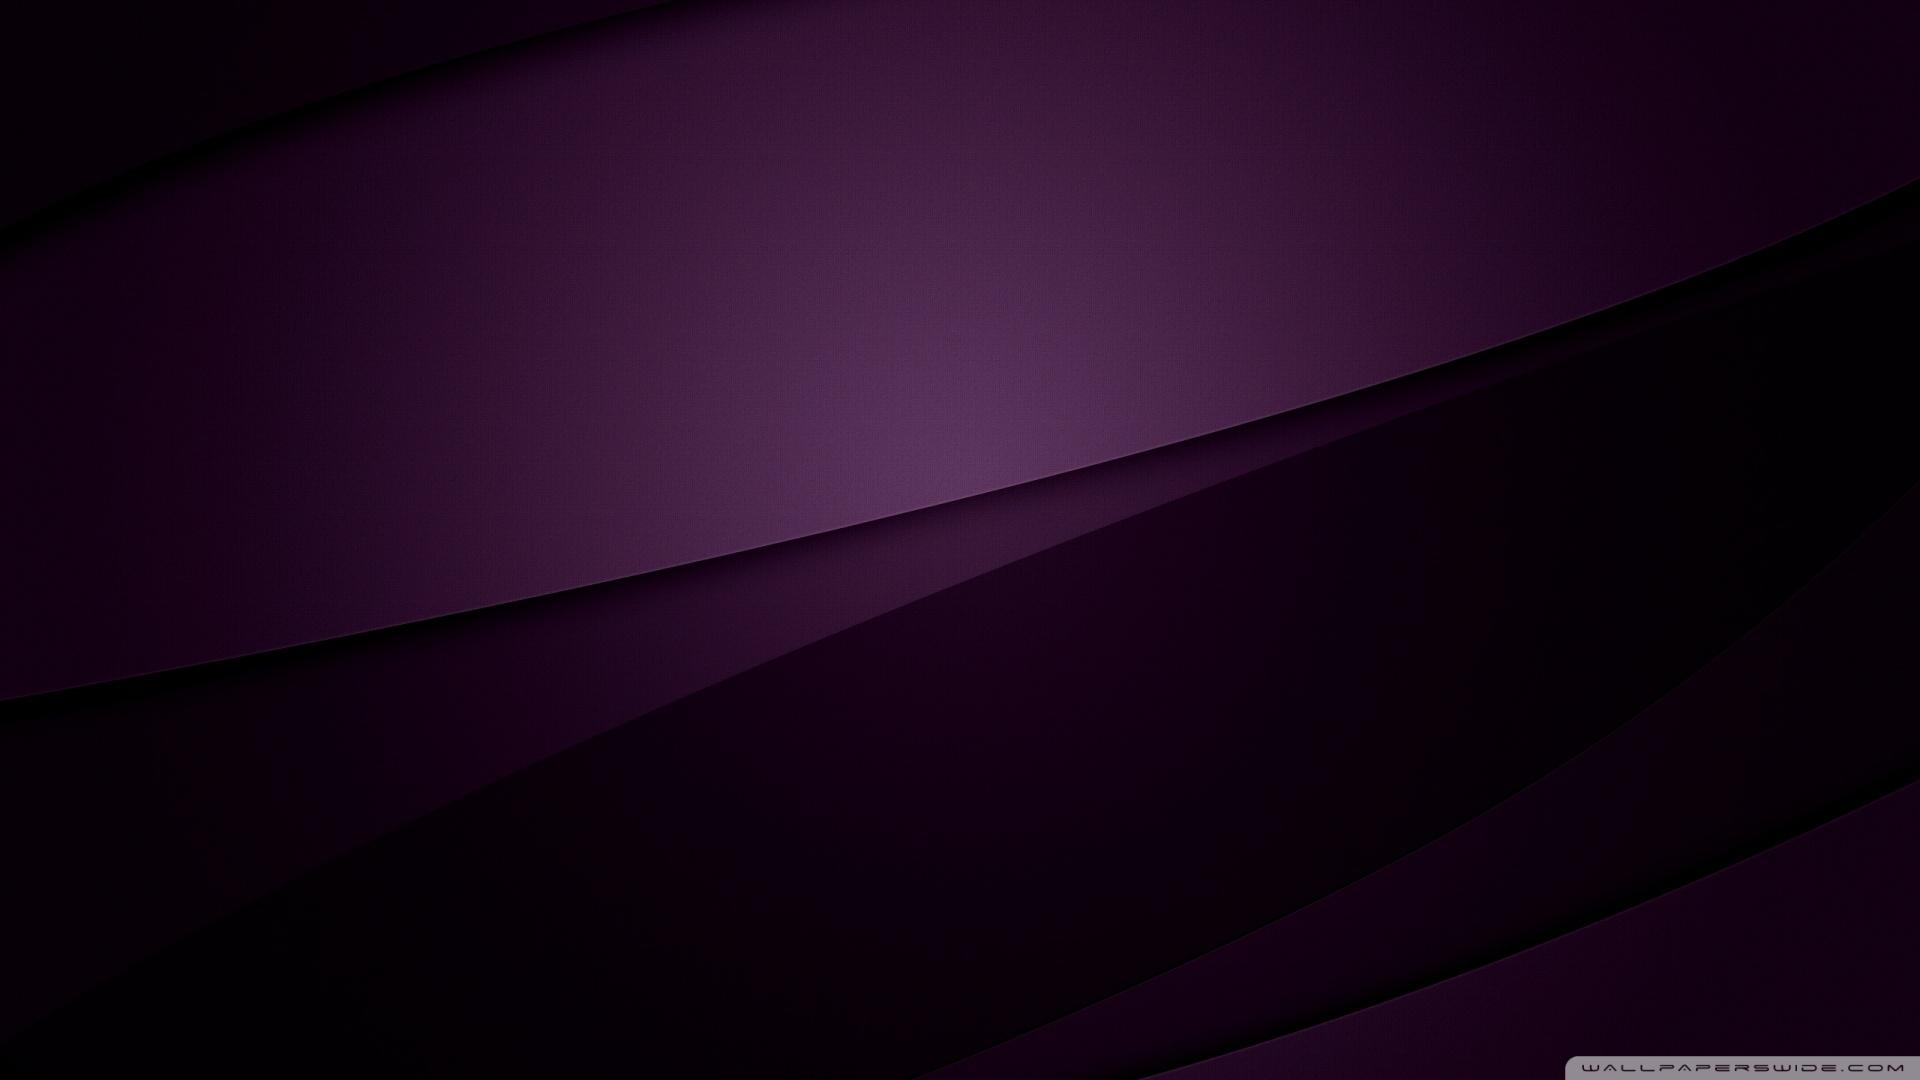 minimalist wallpaper design images 1920x1080 1920x1080